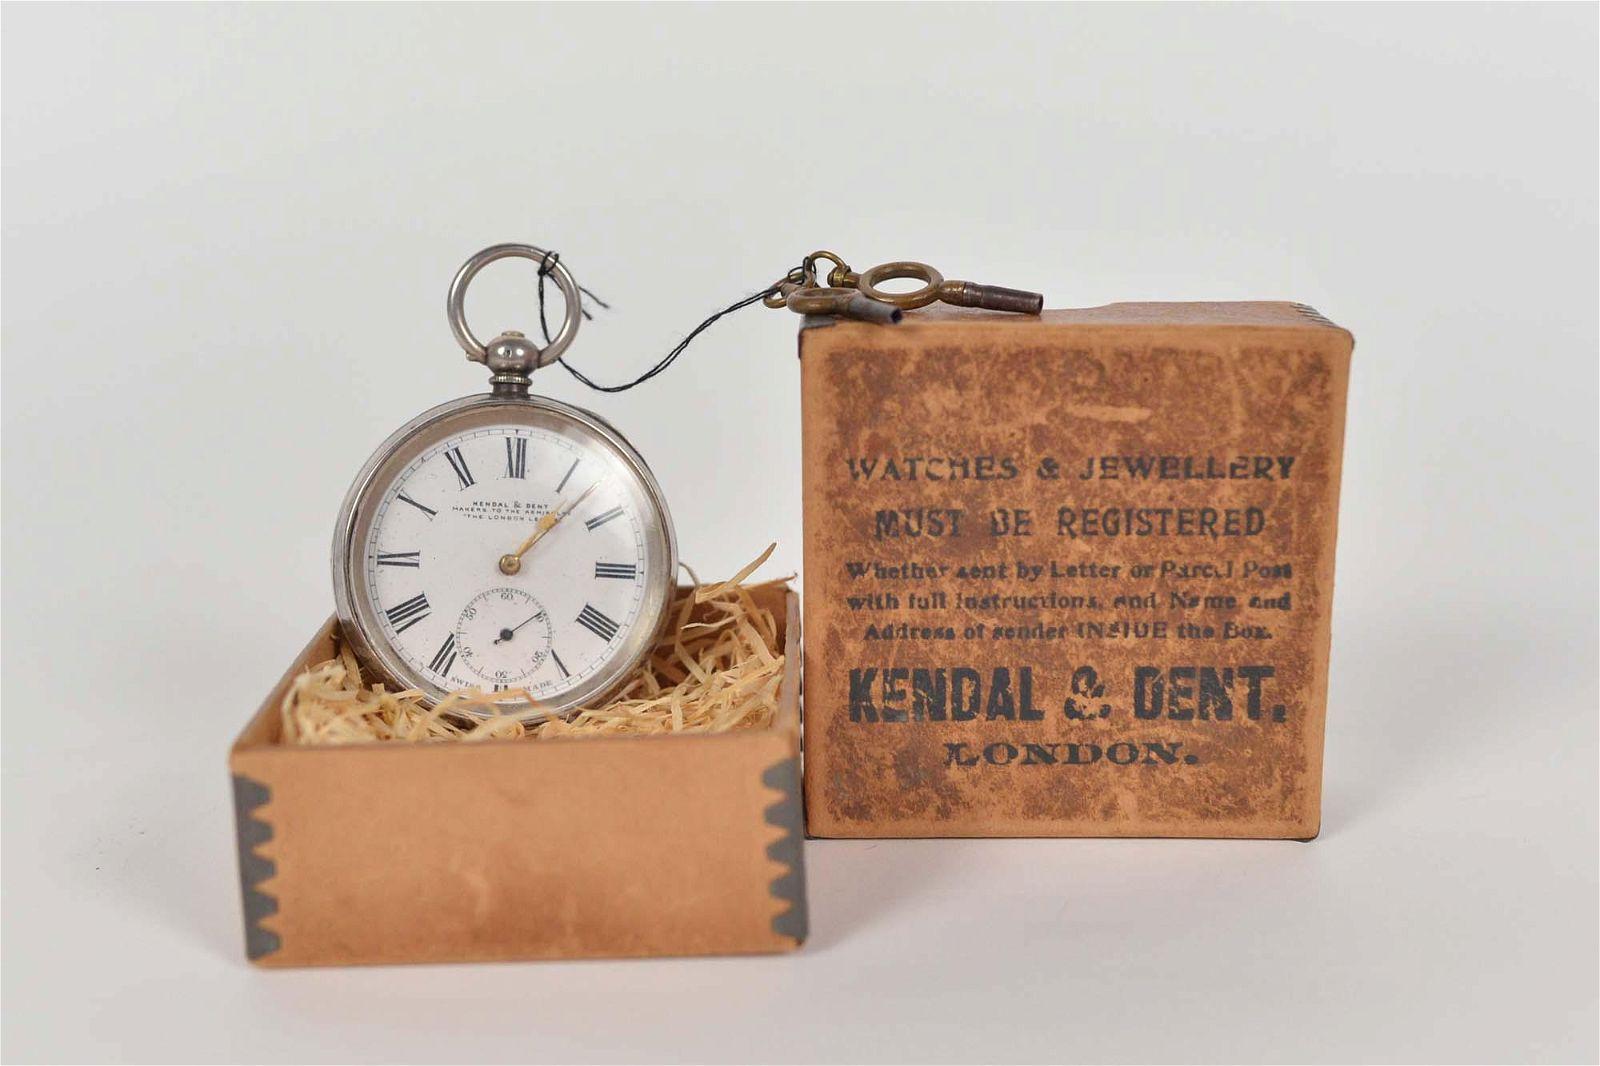 Kendal & Dent. - Antique pocket watch - c.1880